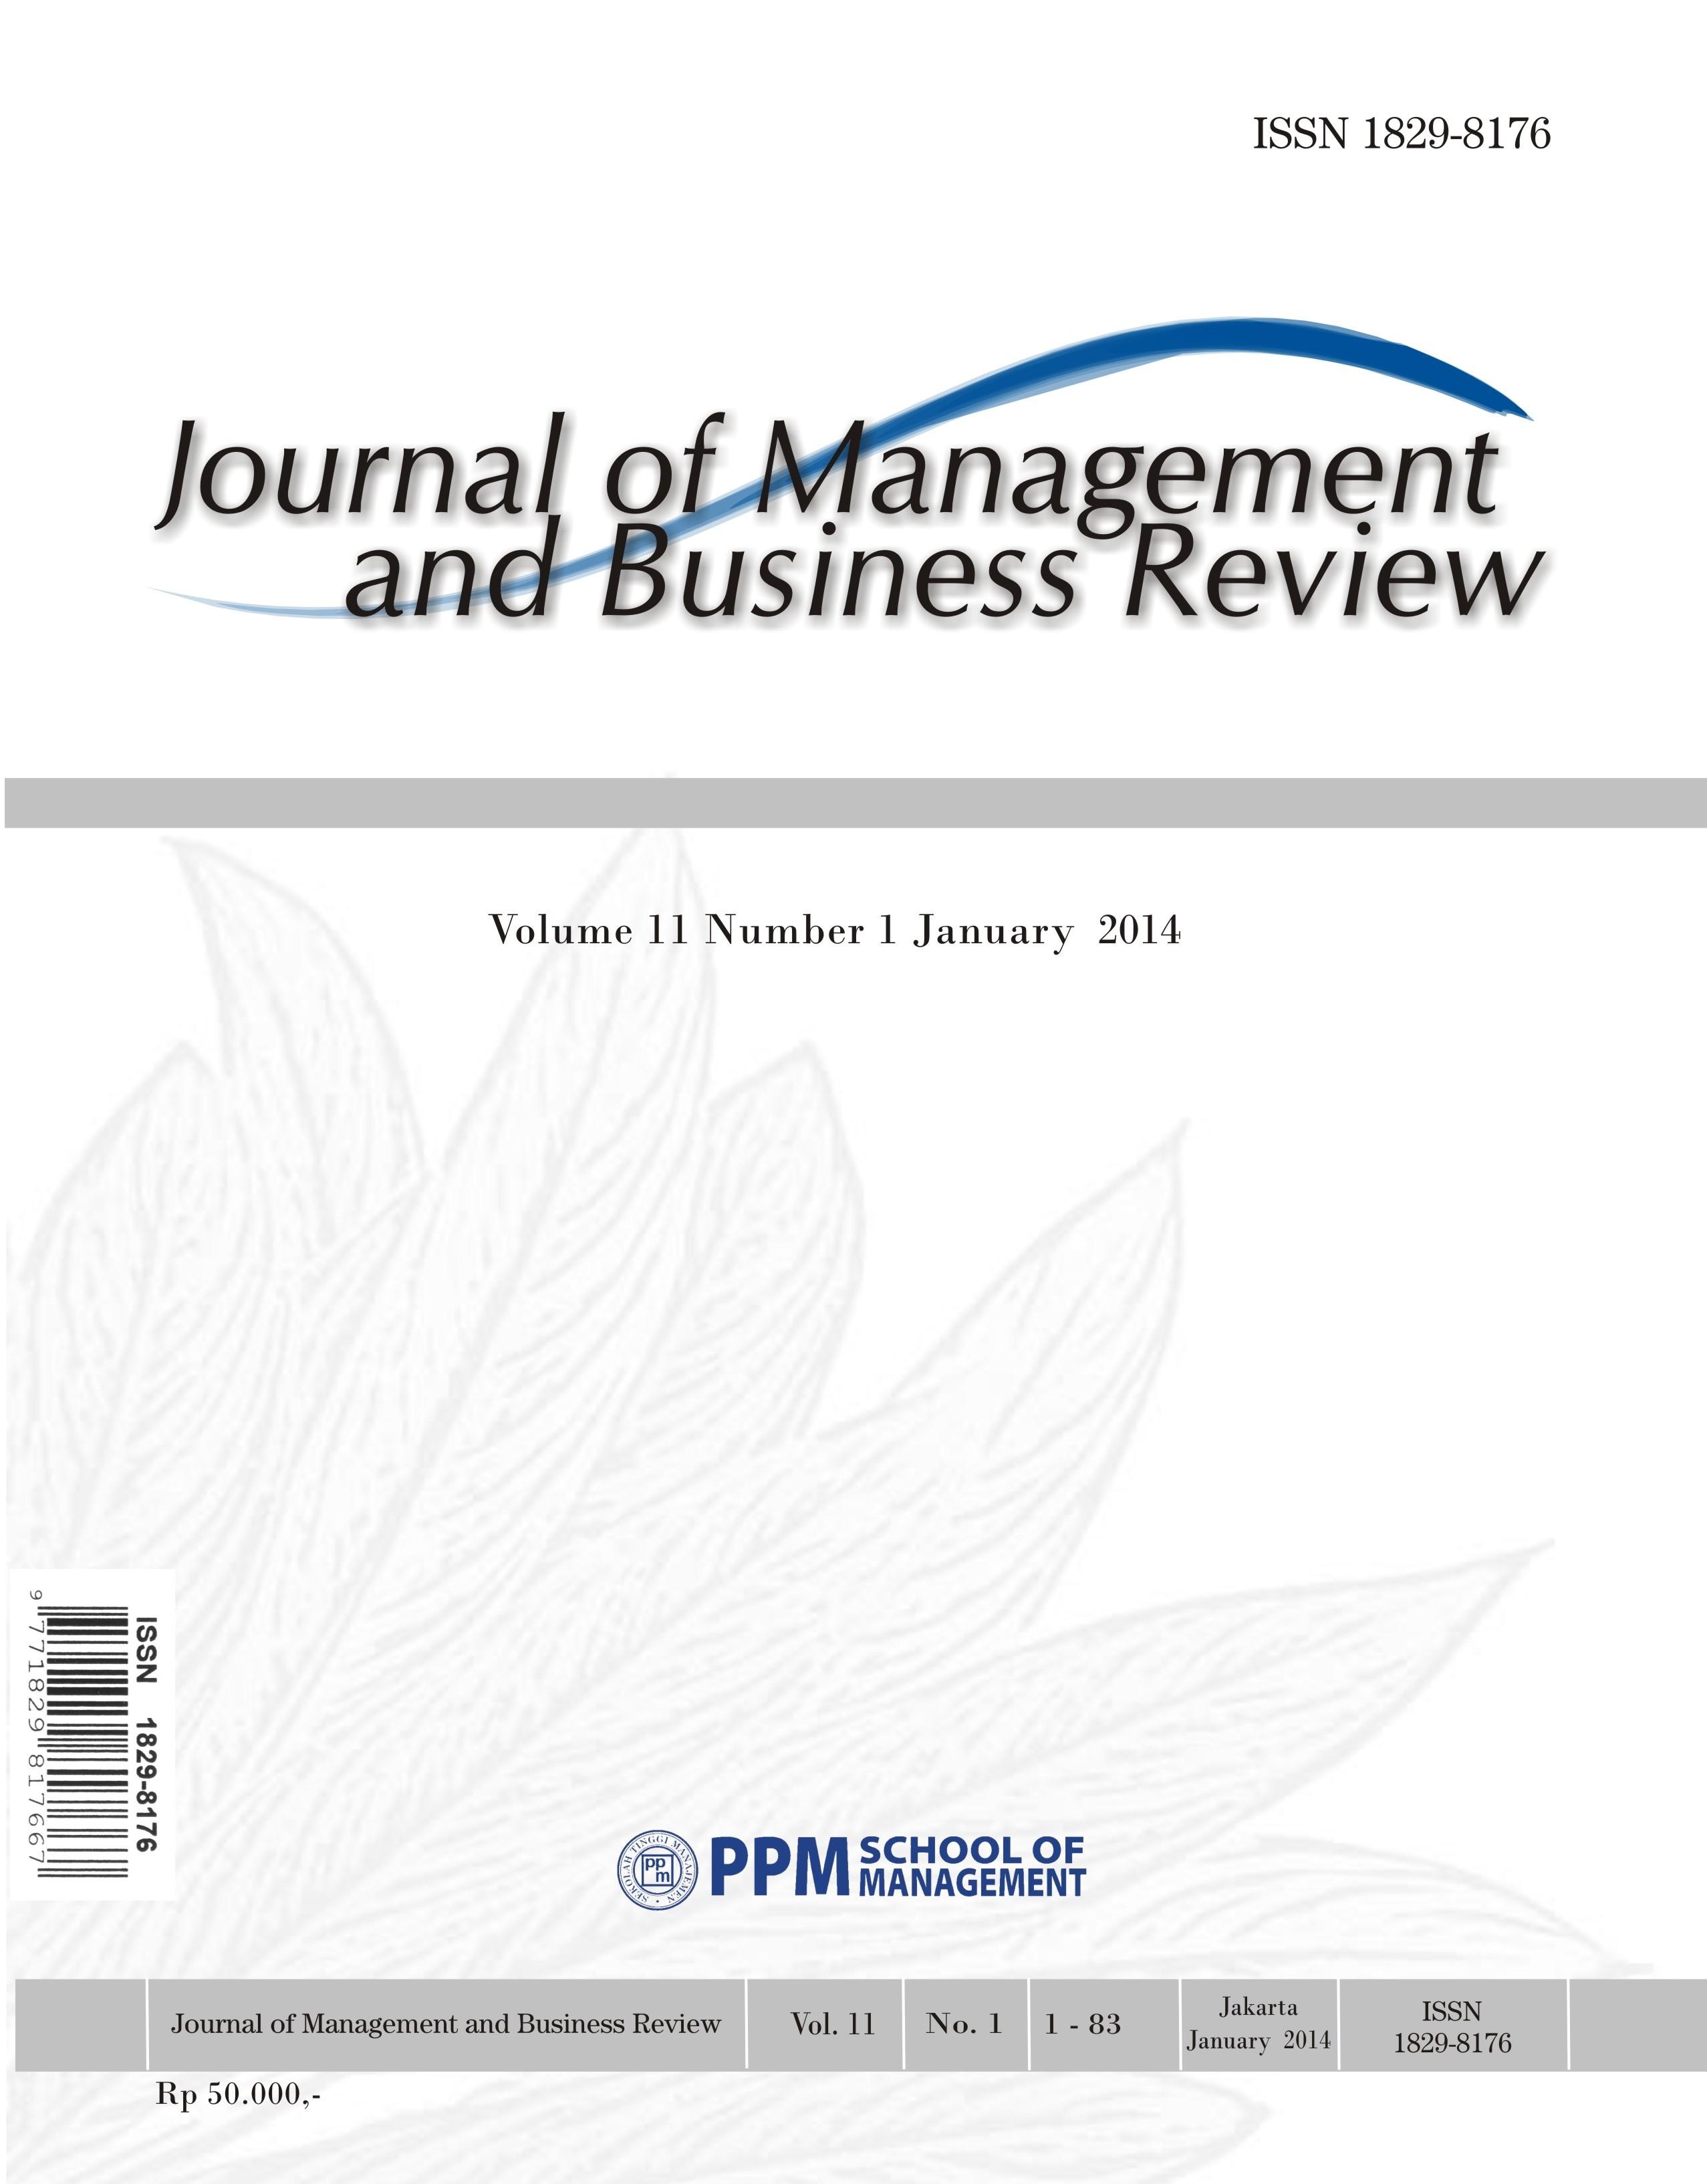 Vol 11 No 1-January 2014_cover